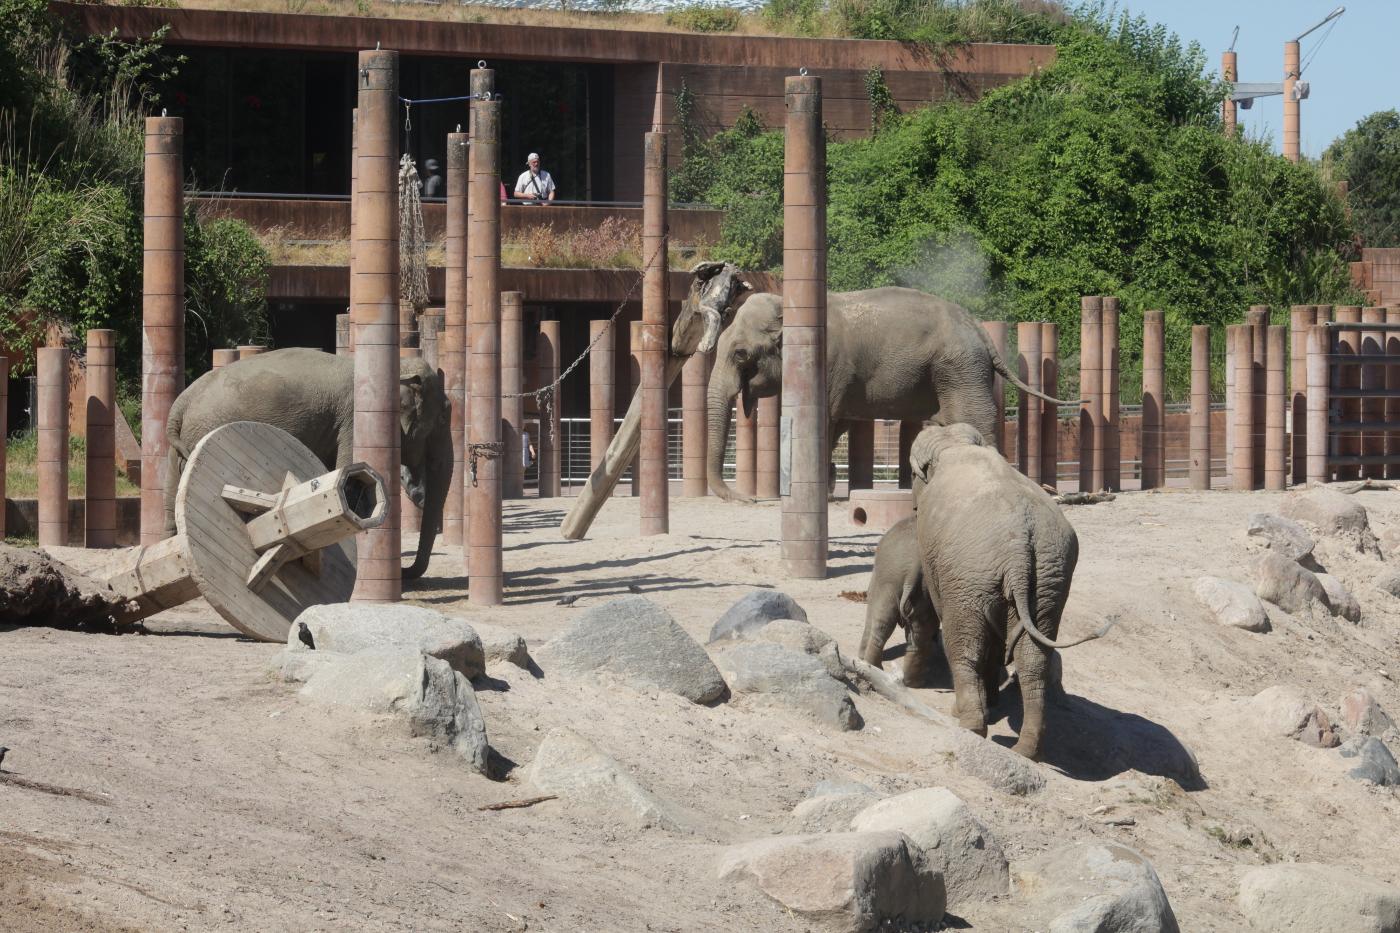 Elefanter i Zoo. Foto: Rolf Larsen.